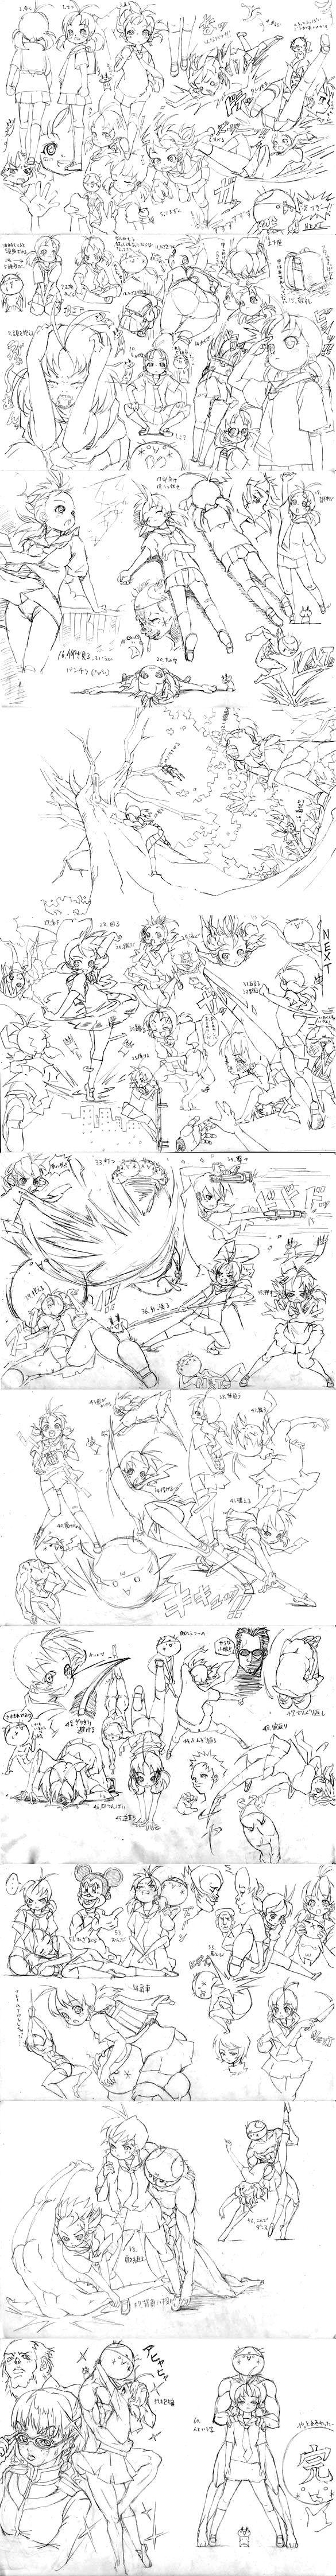 OMG random sketches that I found, beautiful.